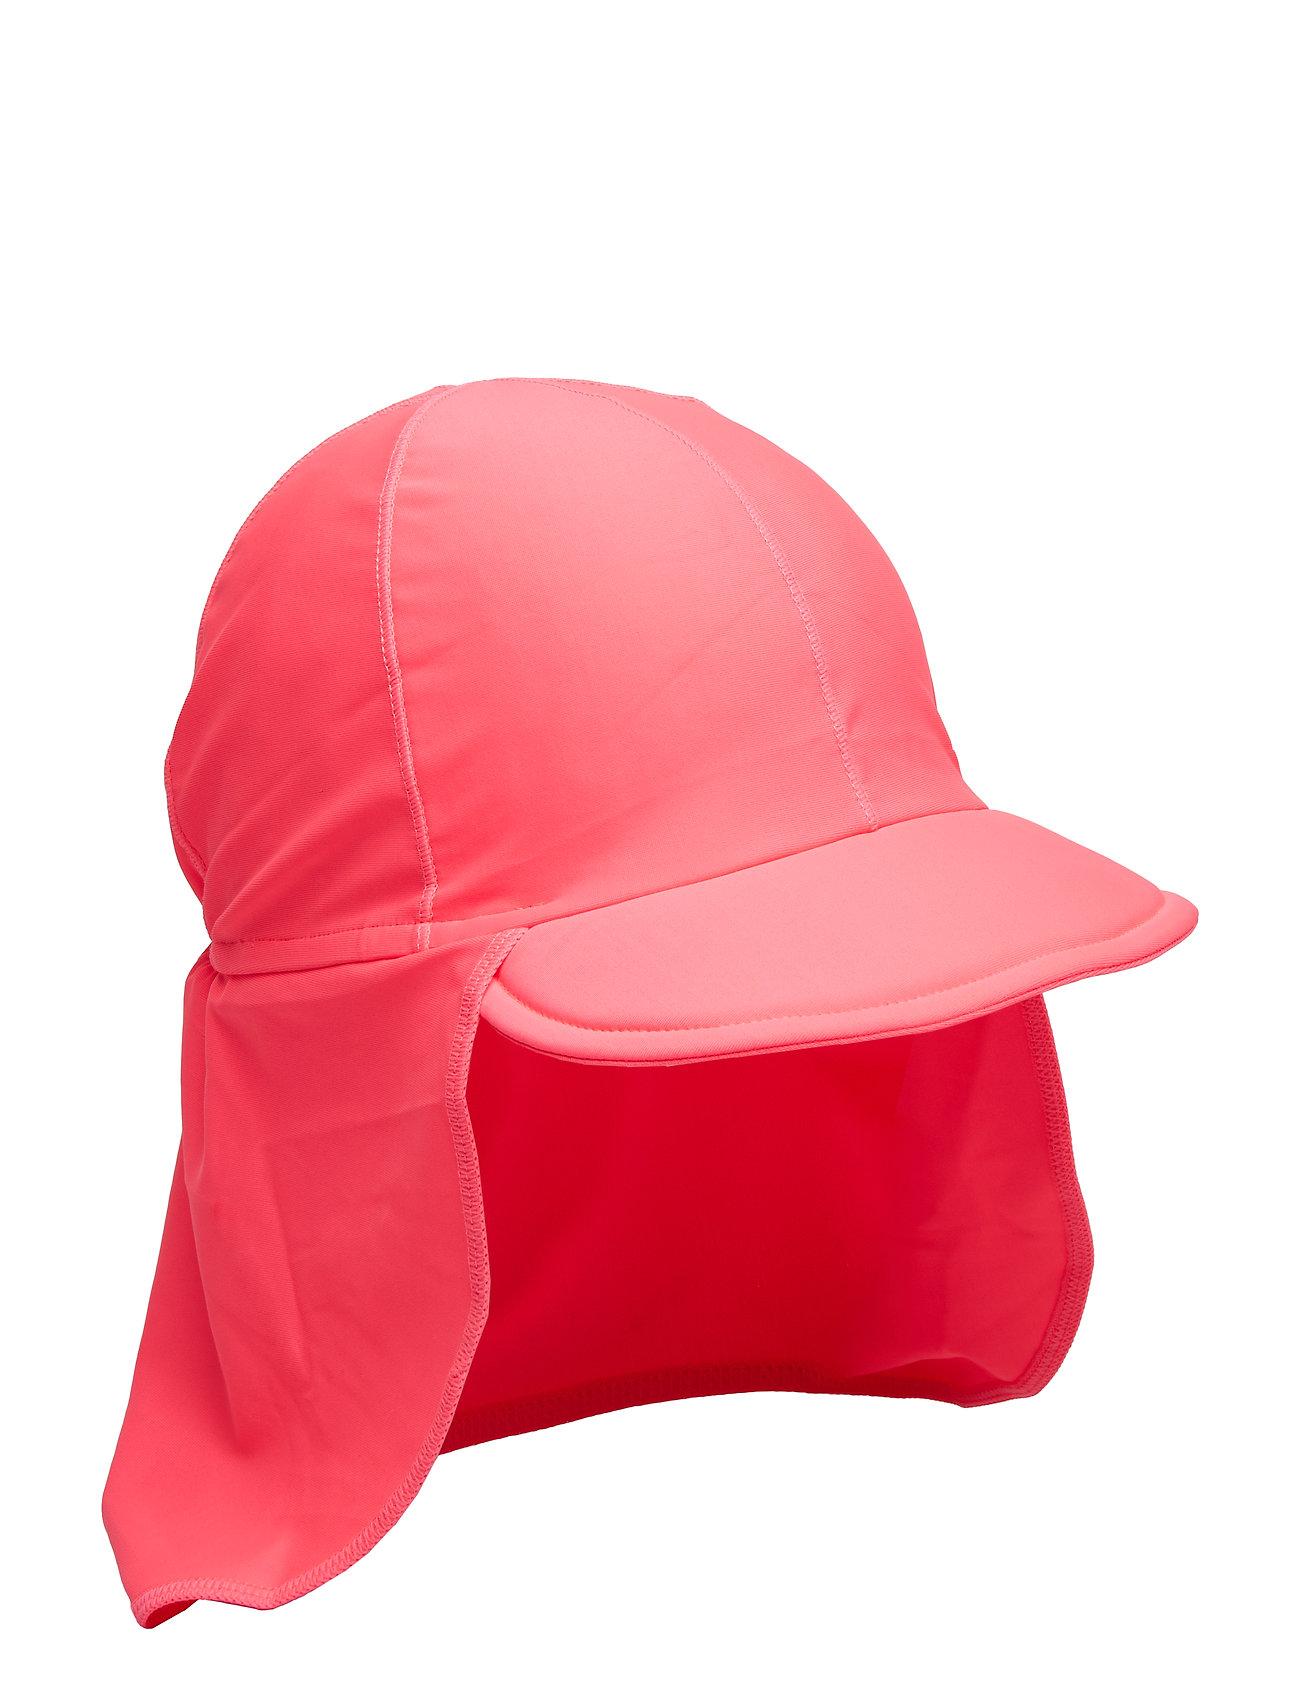 Polarn O. Pyret UPF 50 CAP Solid Preschool